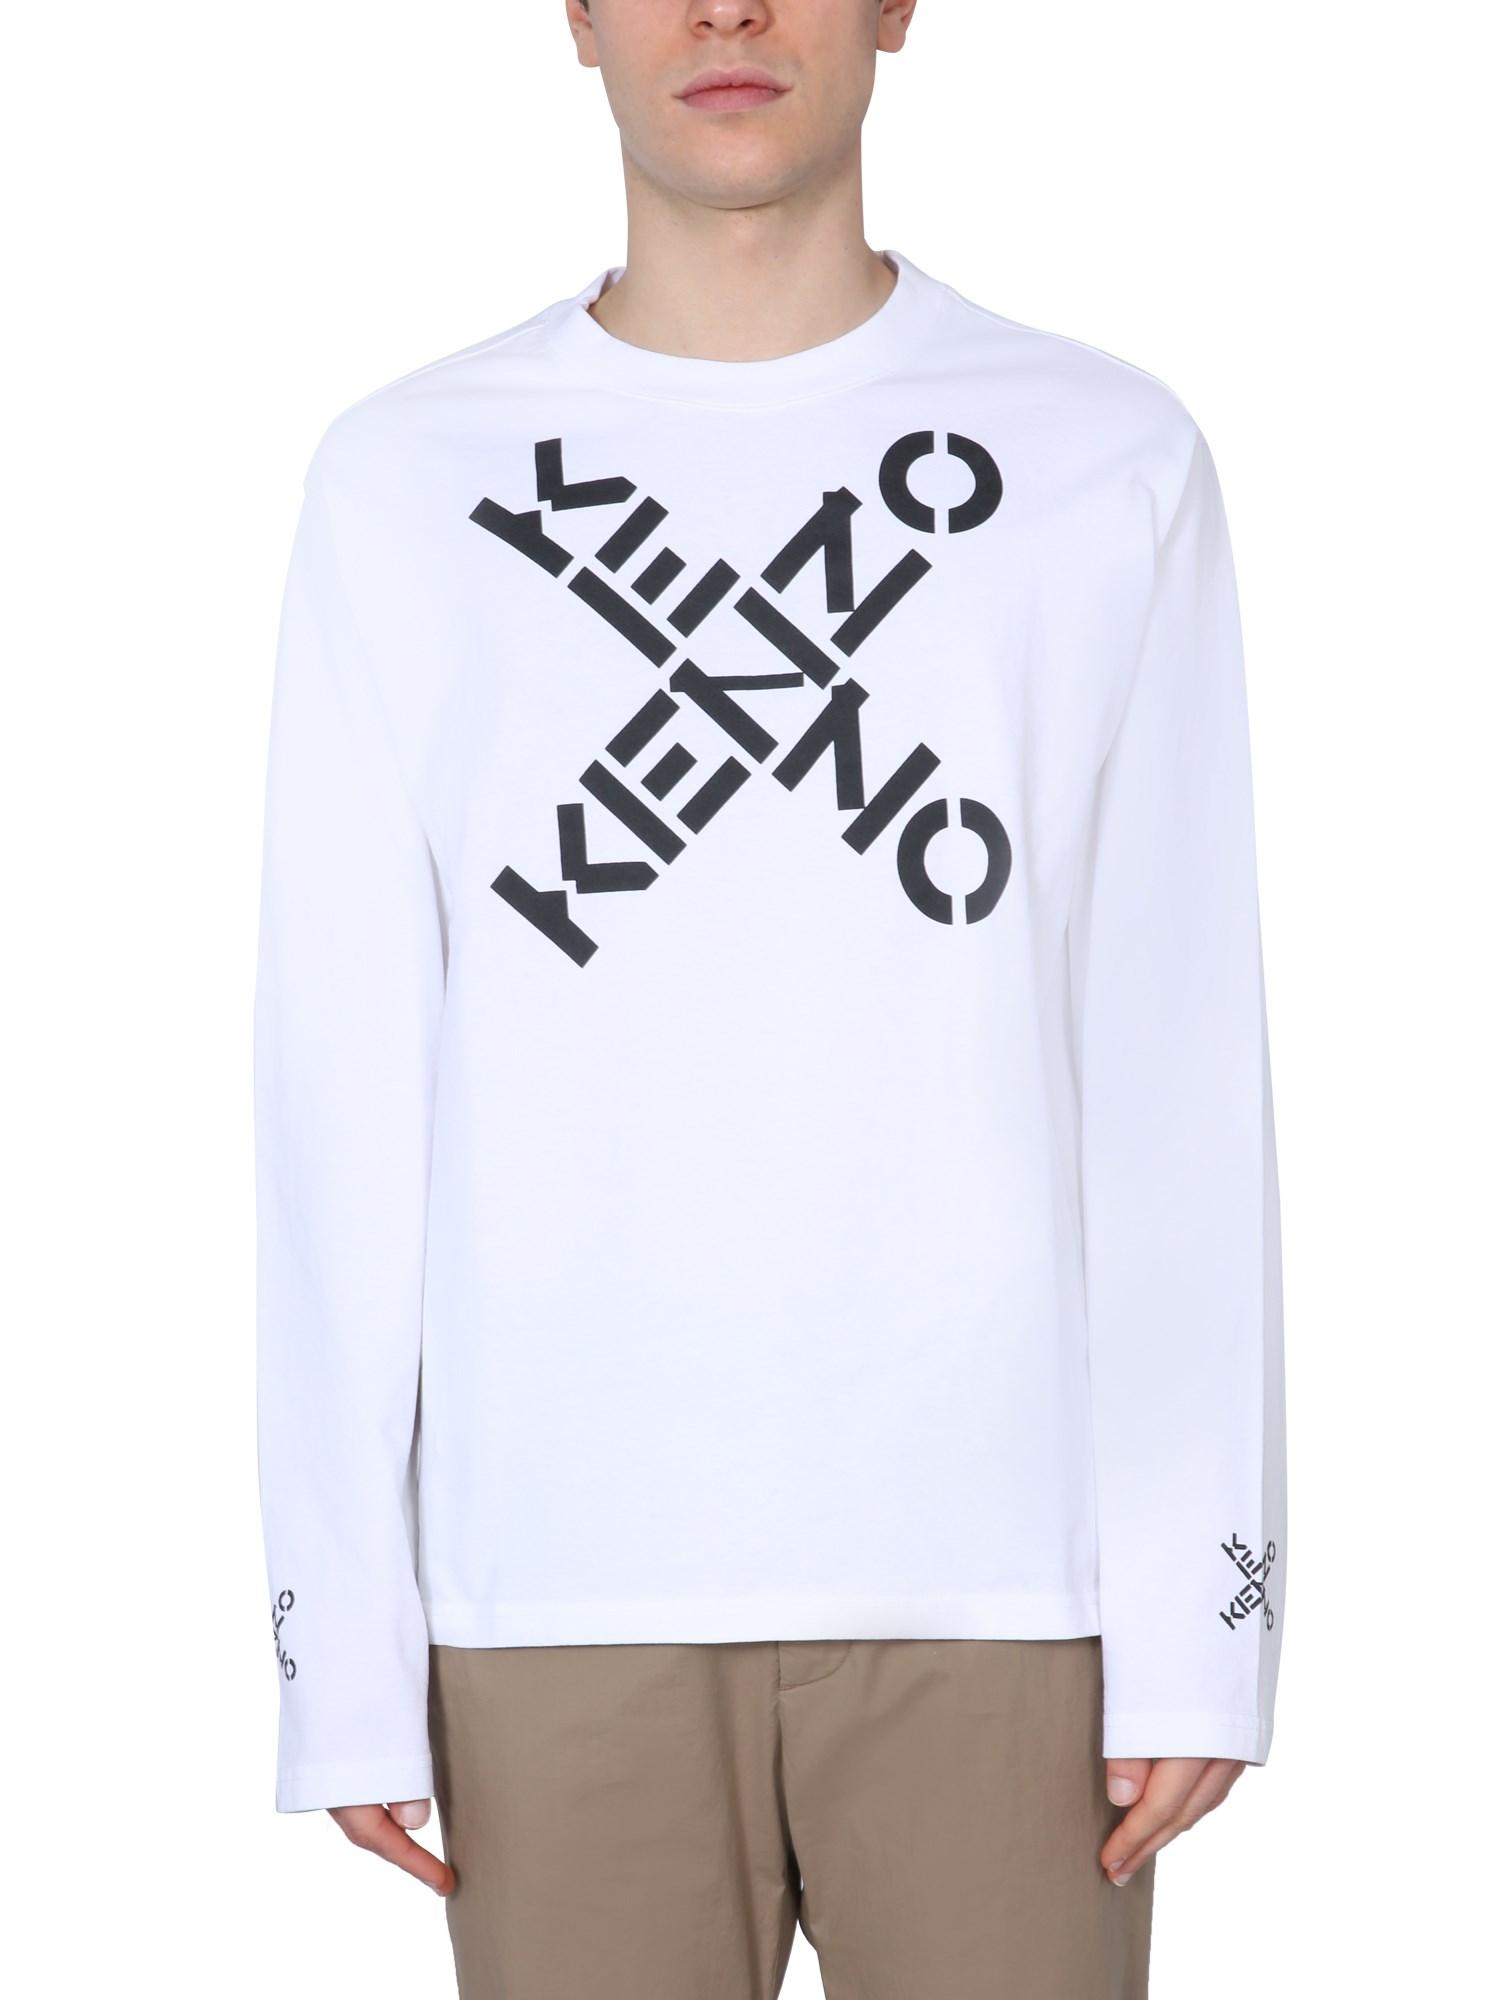 kenzo crew neck t-shirt